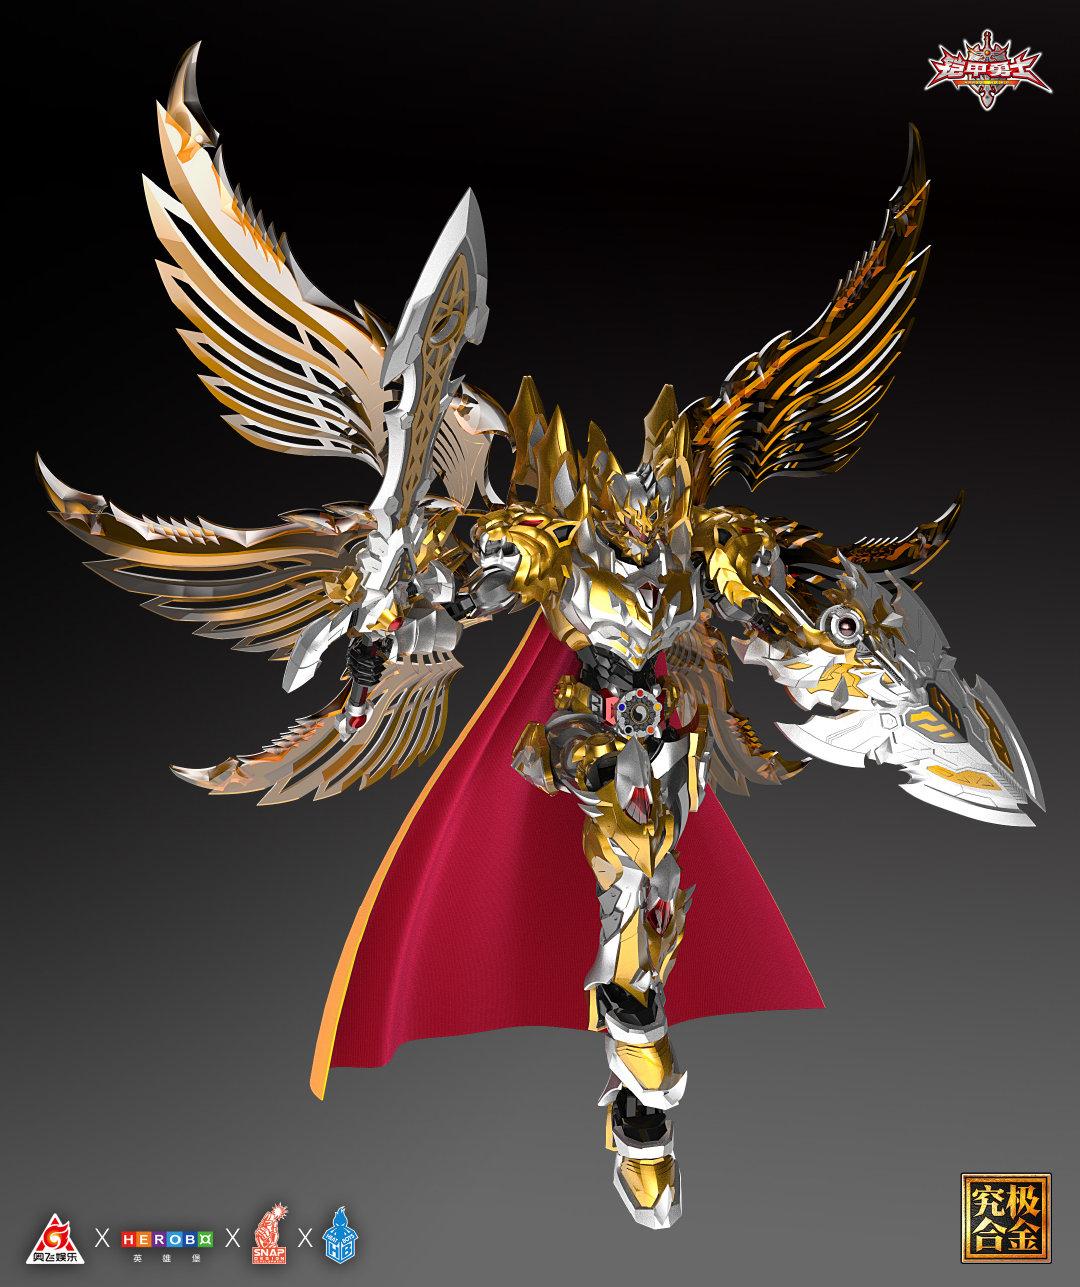 S535_Armor_hero_Emperor_037.jpg